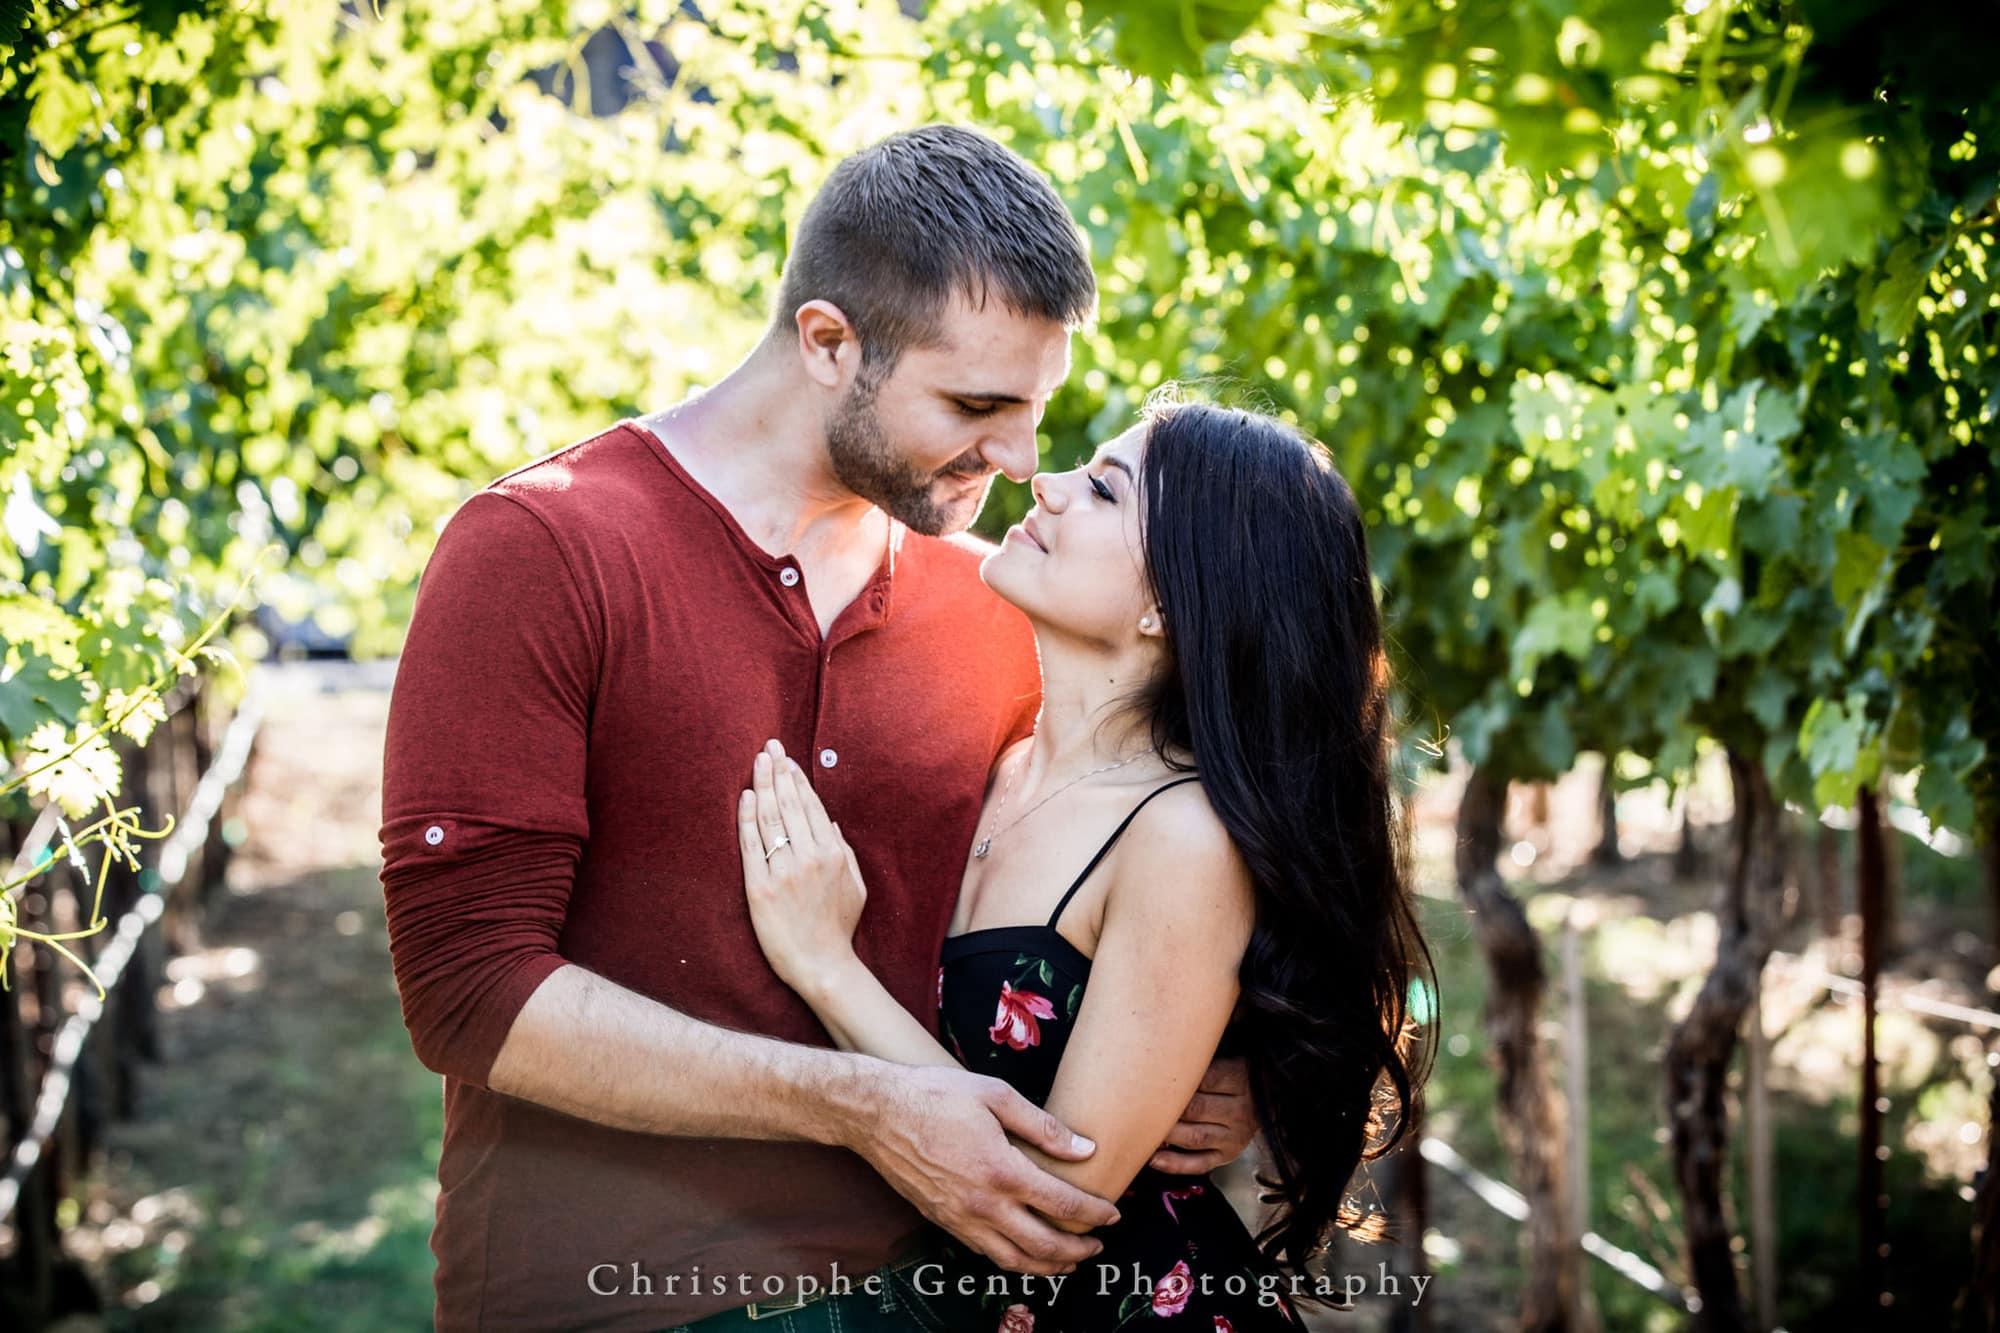 Castello di Amorosa Marriage Proposal Photography 350